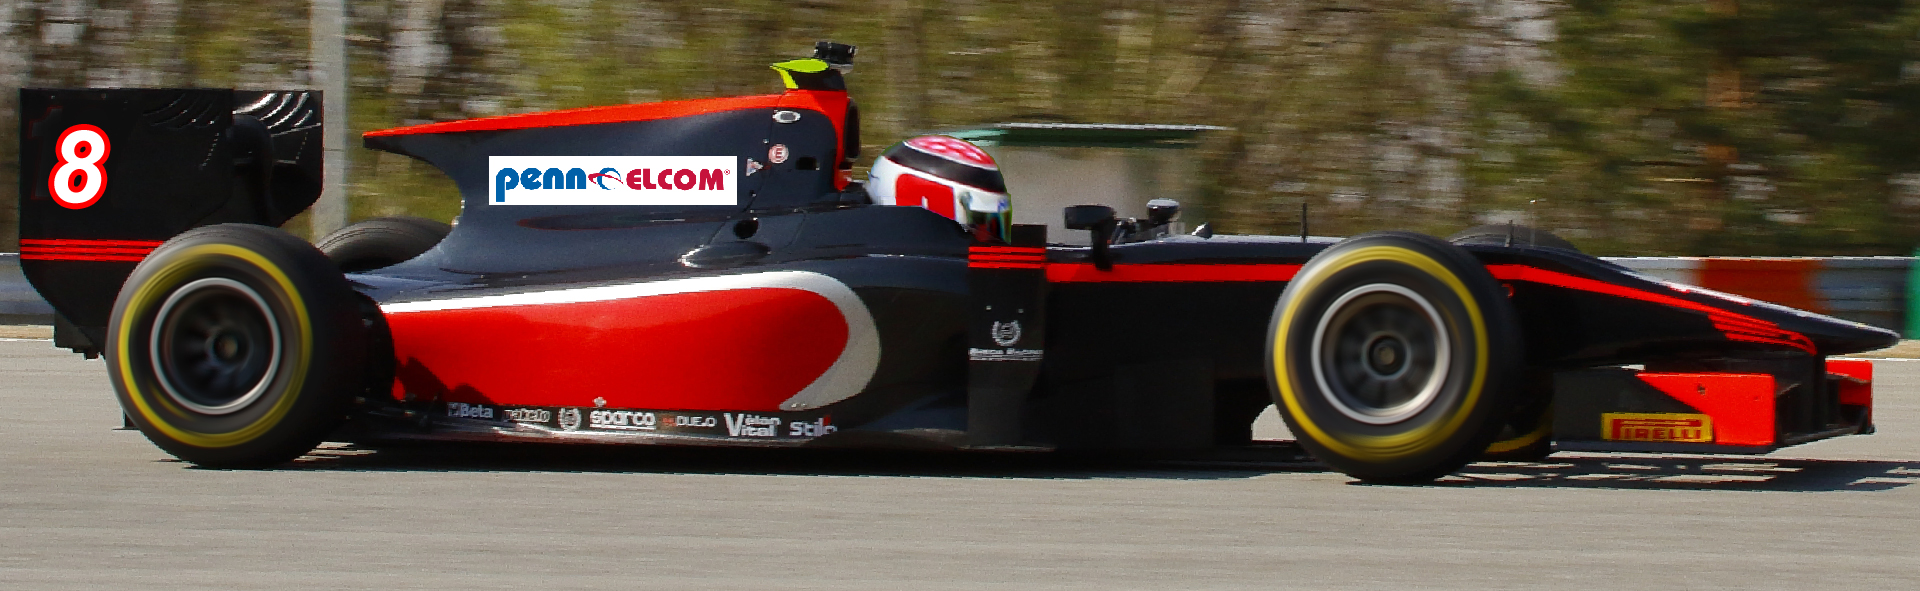 Dallara-Judd